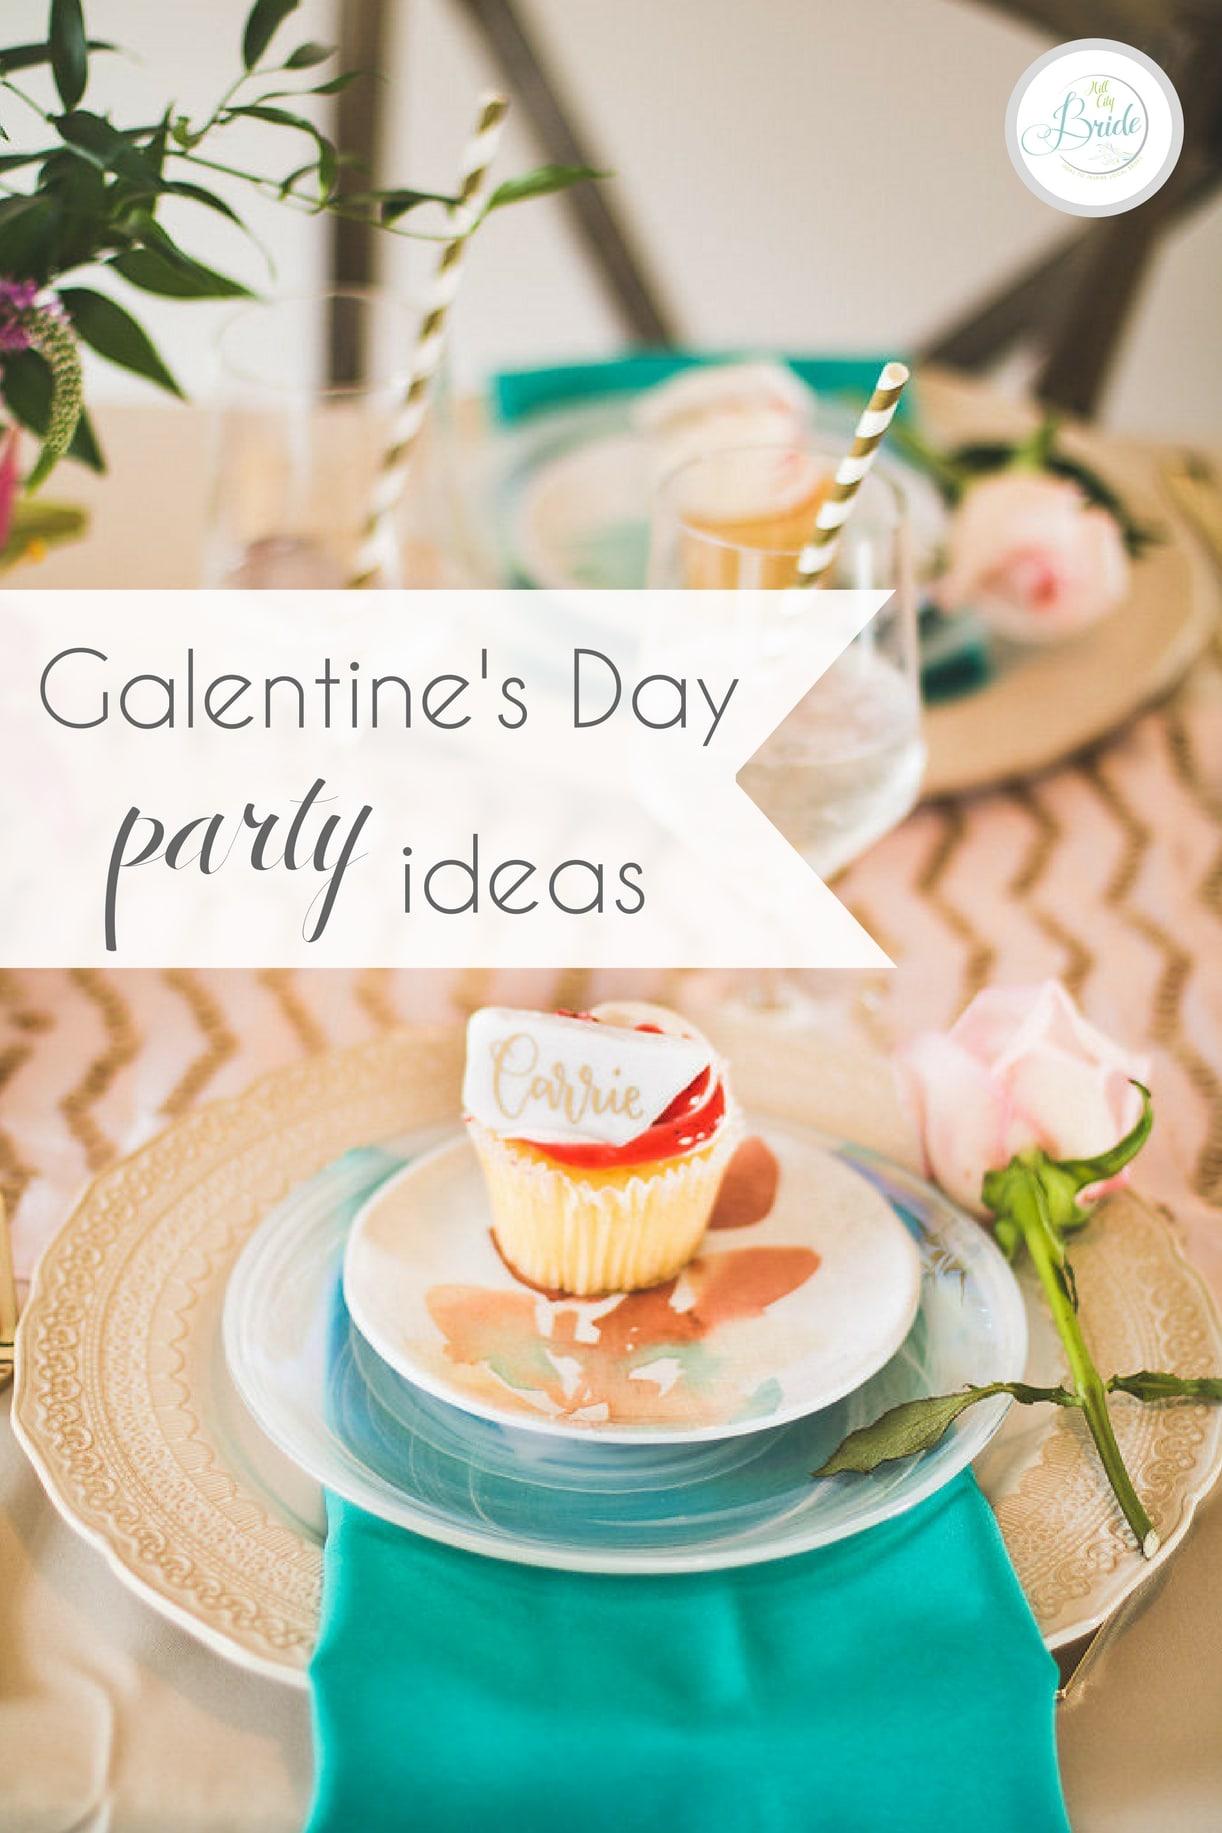 galentine s day party ideas hill city bride virginia. Black Bedroom Furniture Sets. Home Design Ideas